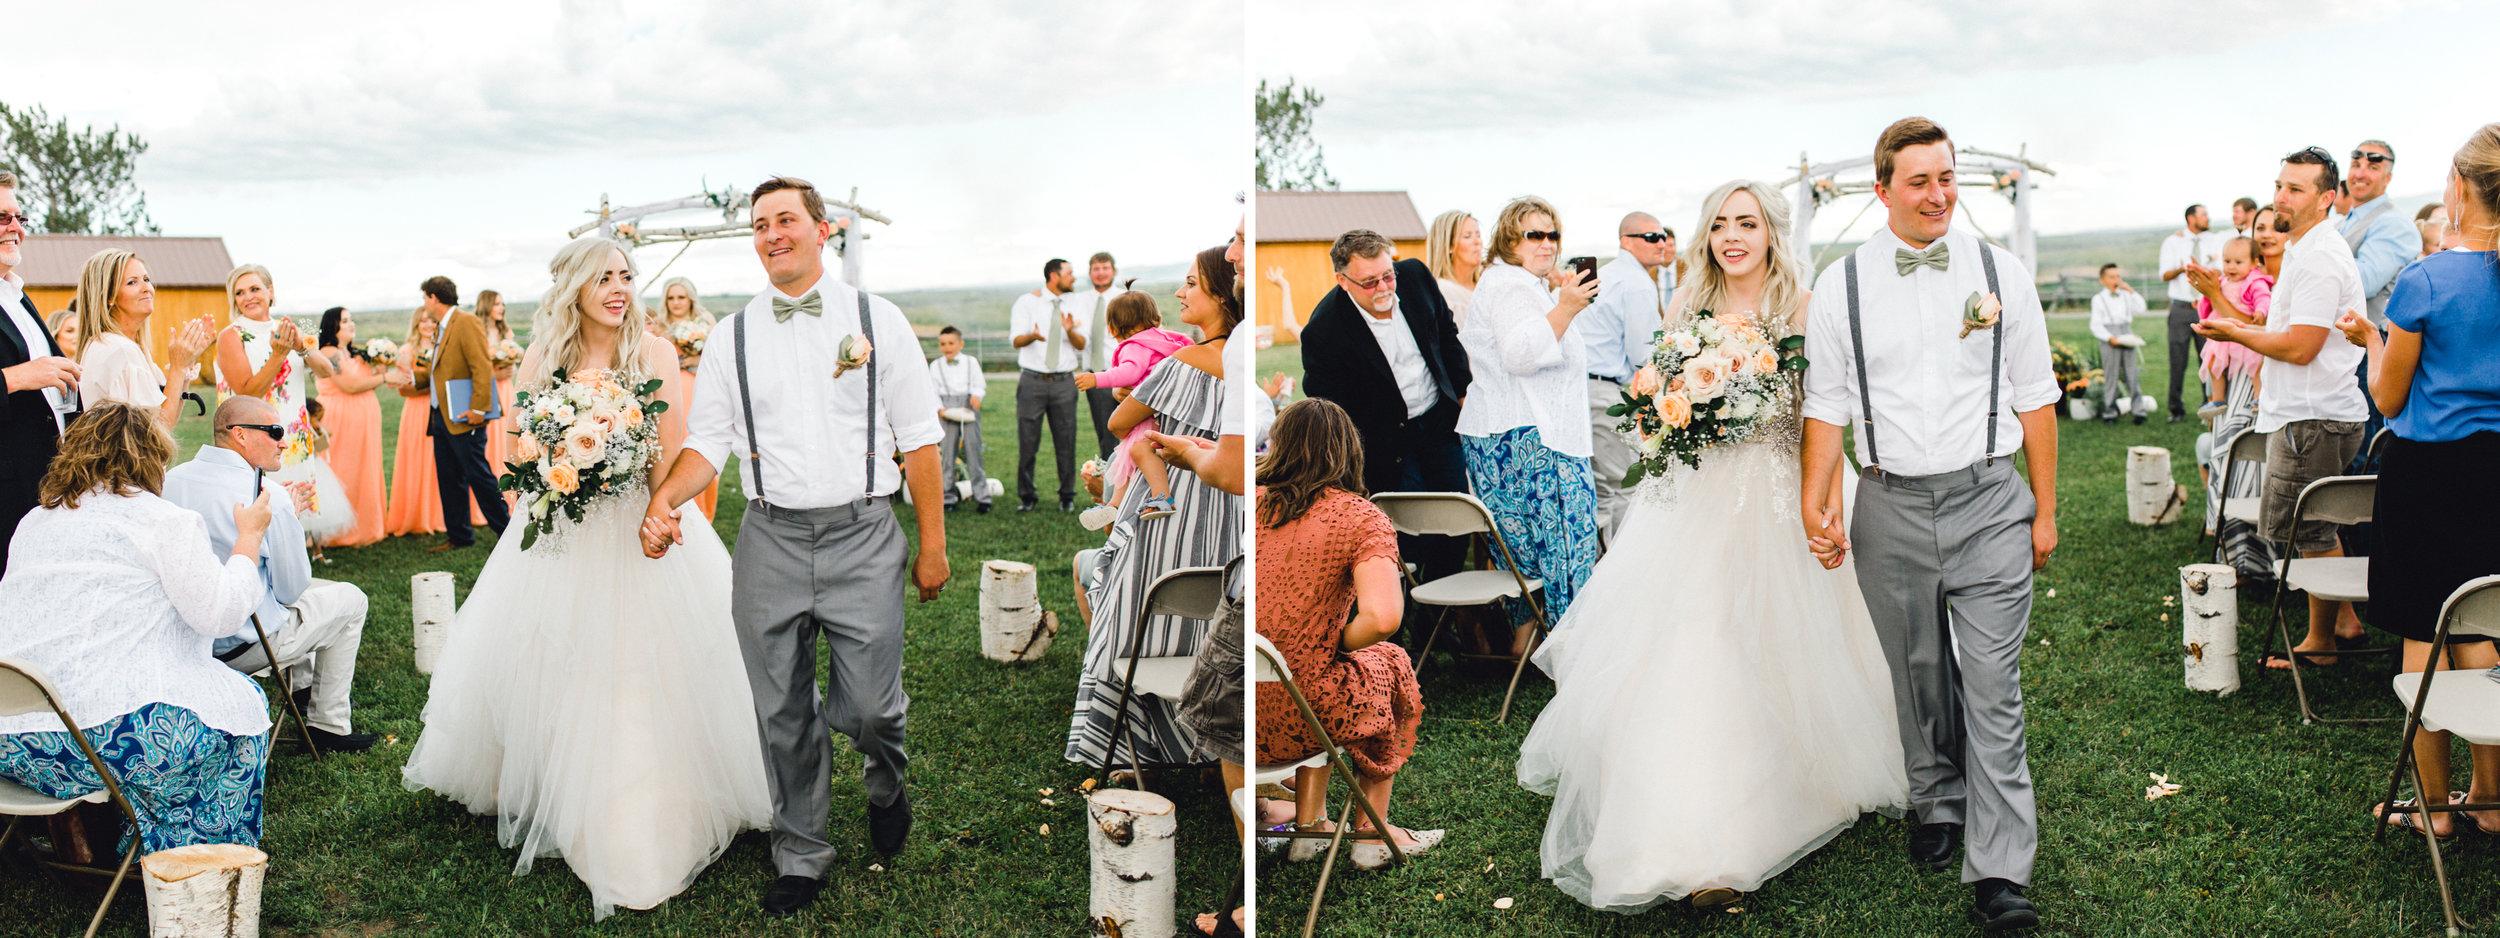 country-outdoor-rustic-wedding-tetons-idaho-anna-christine-photo-21.jpg